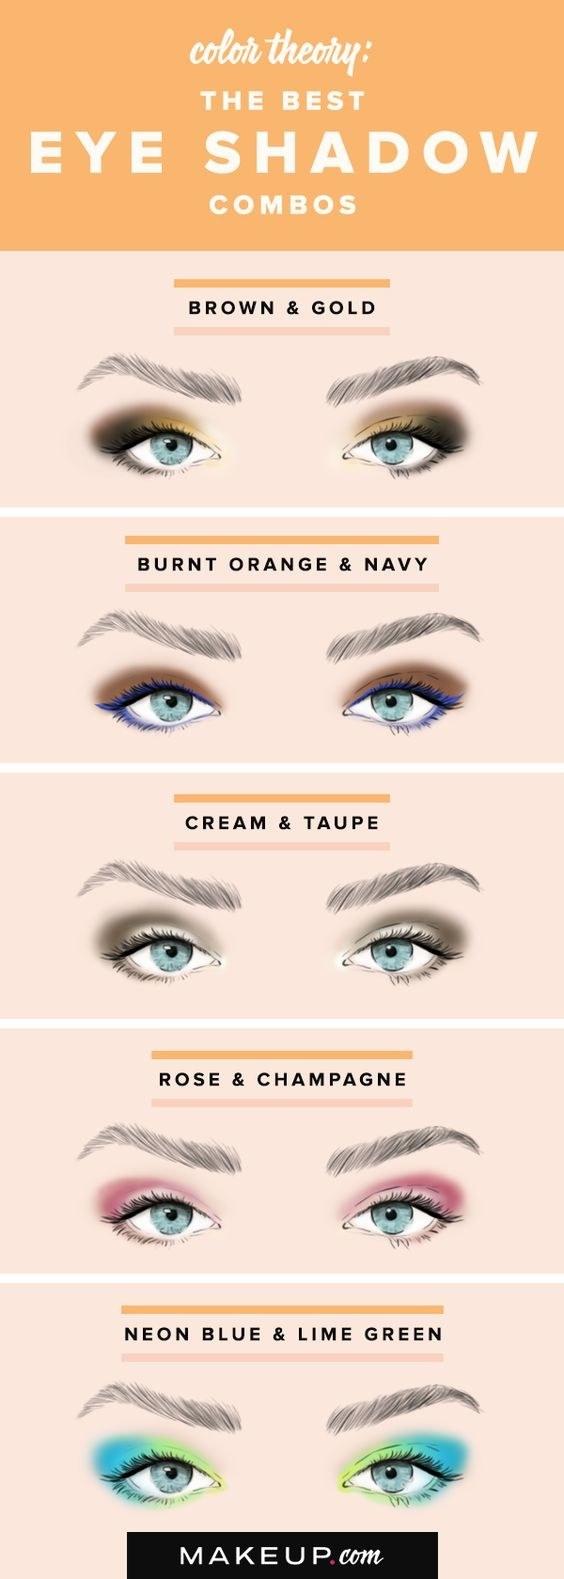 18 Eye Makeup Cheat Sheets If You Don T